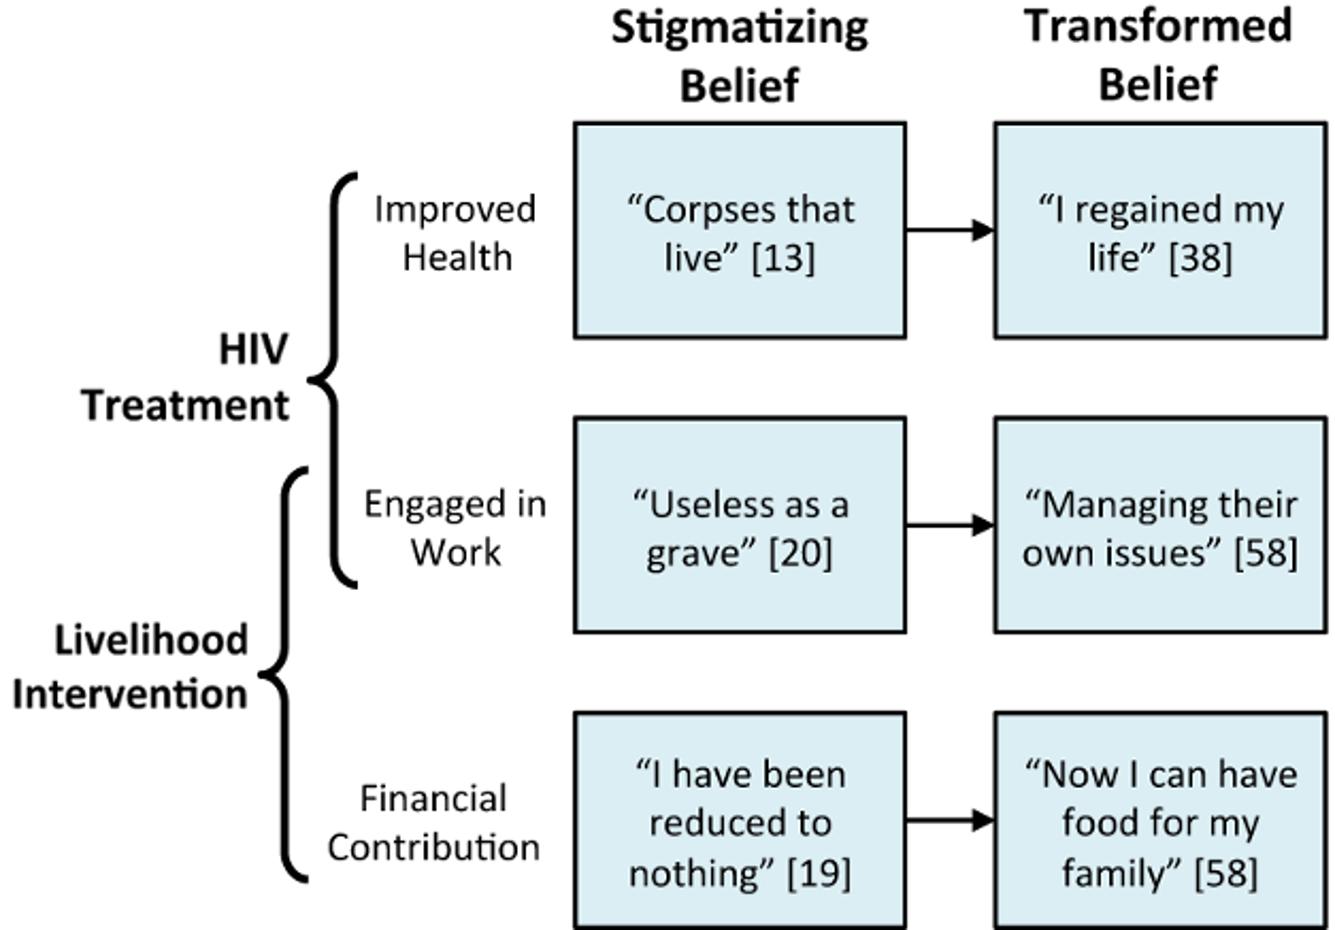 Transforming HIV-stigmatizing beliefs through ART-plus.